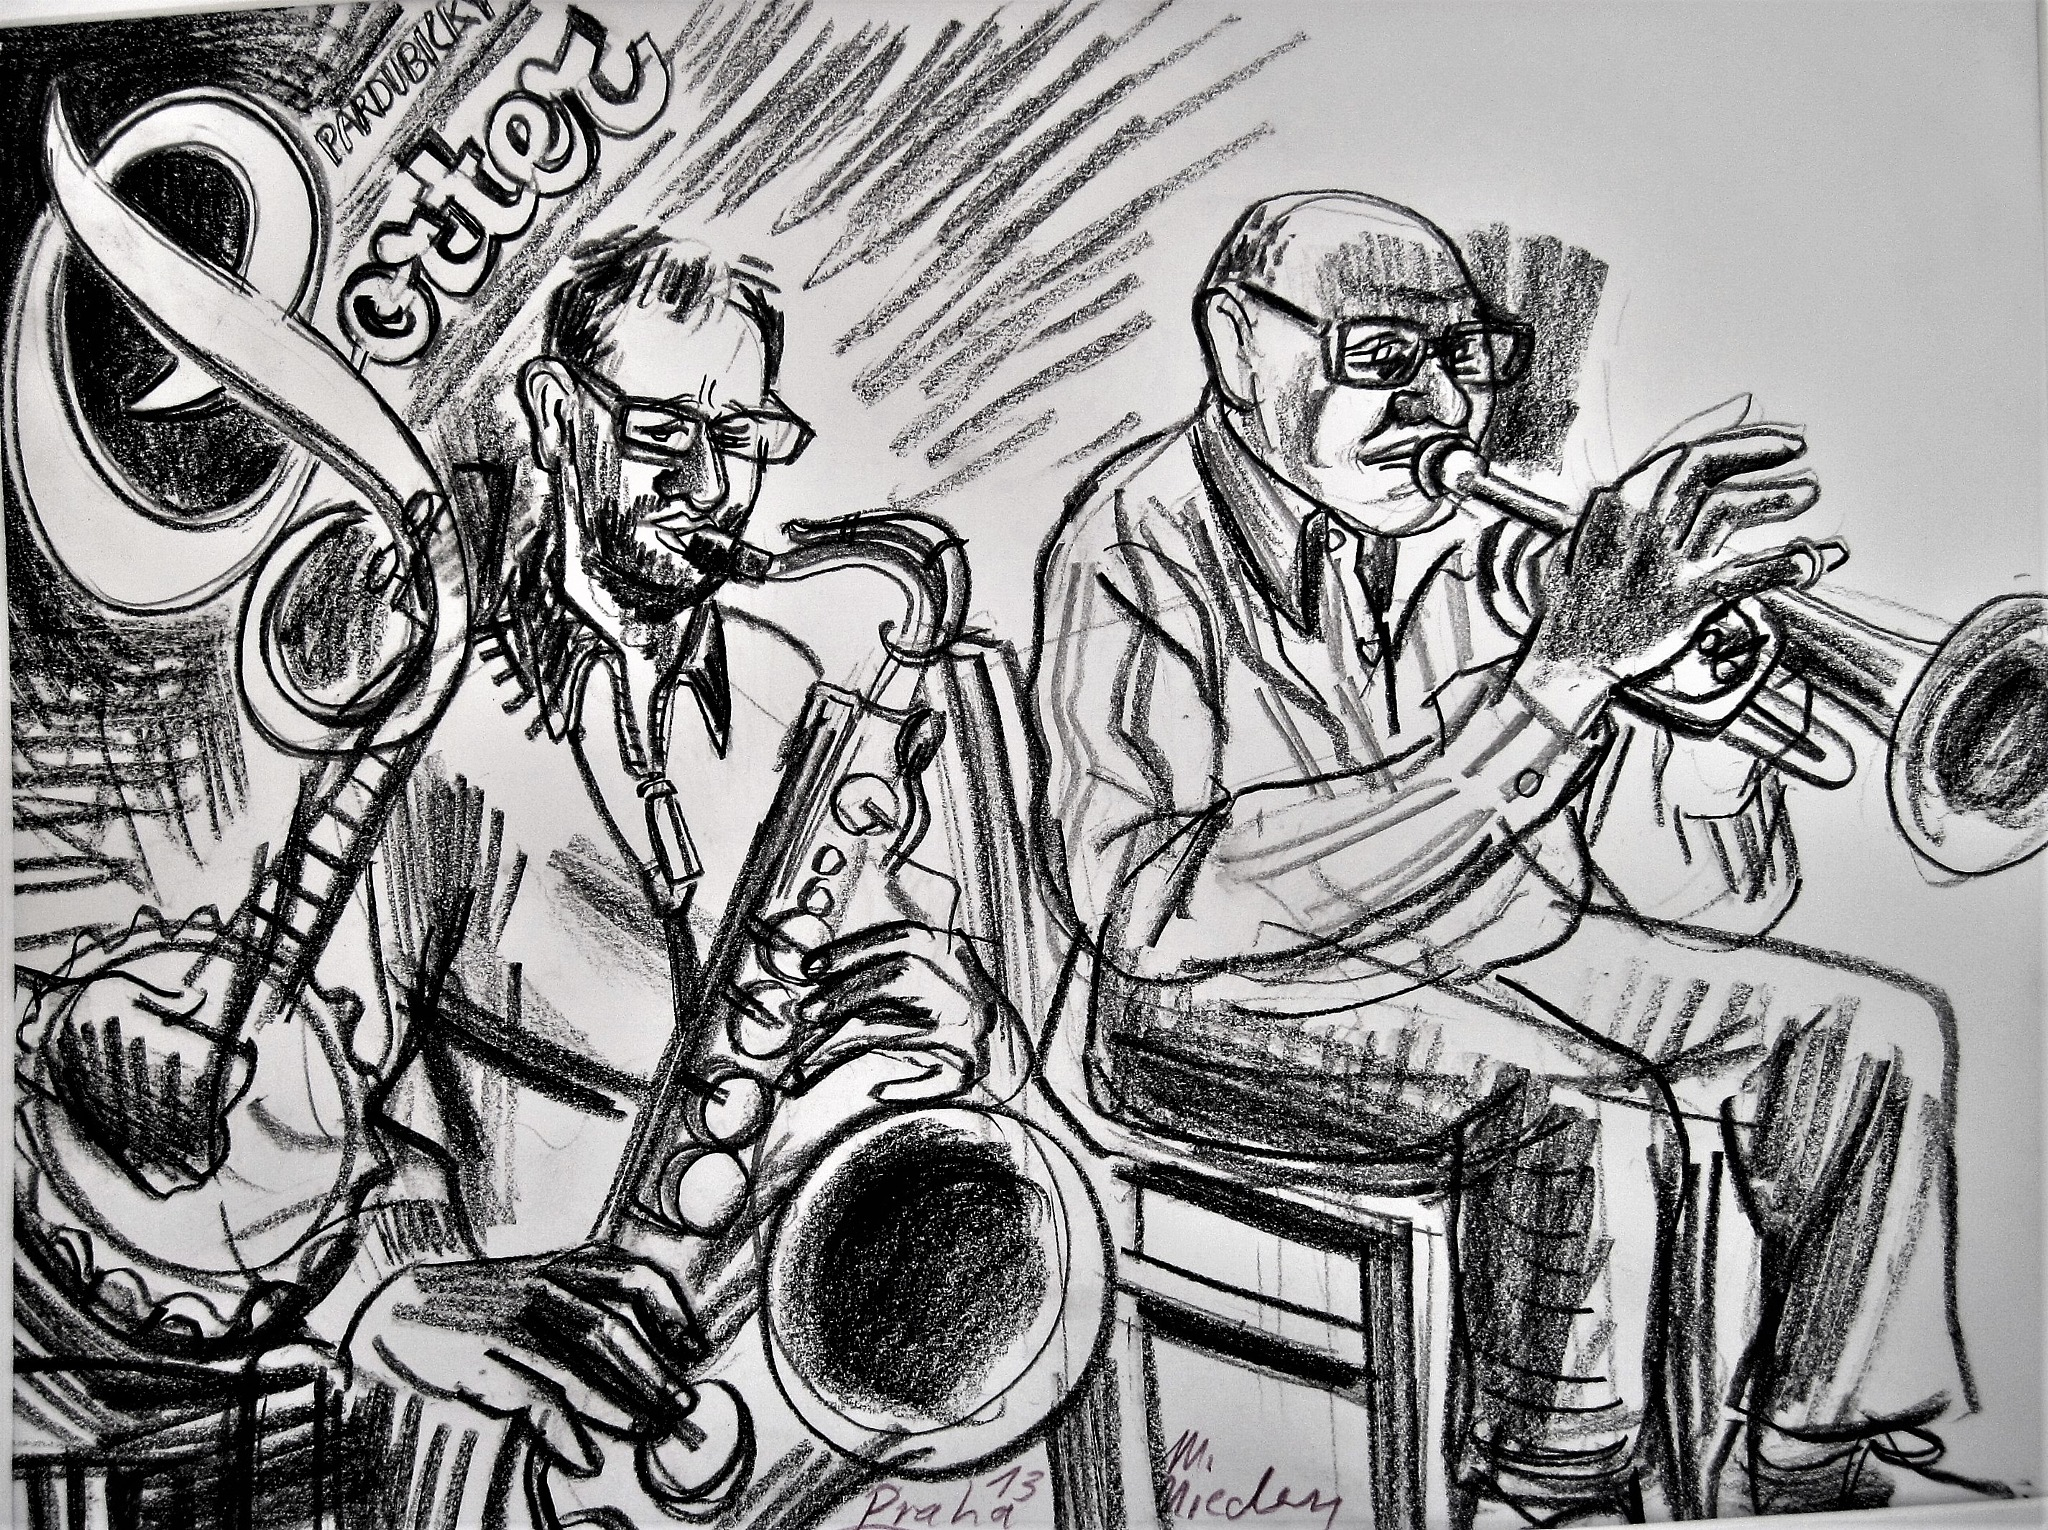 Porter Blues Full Drawing by Markus Nieden